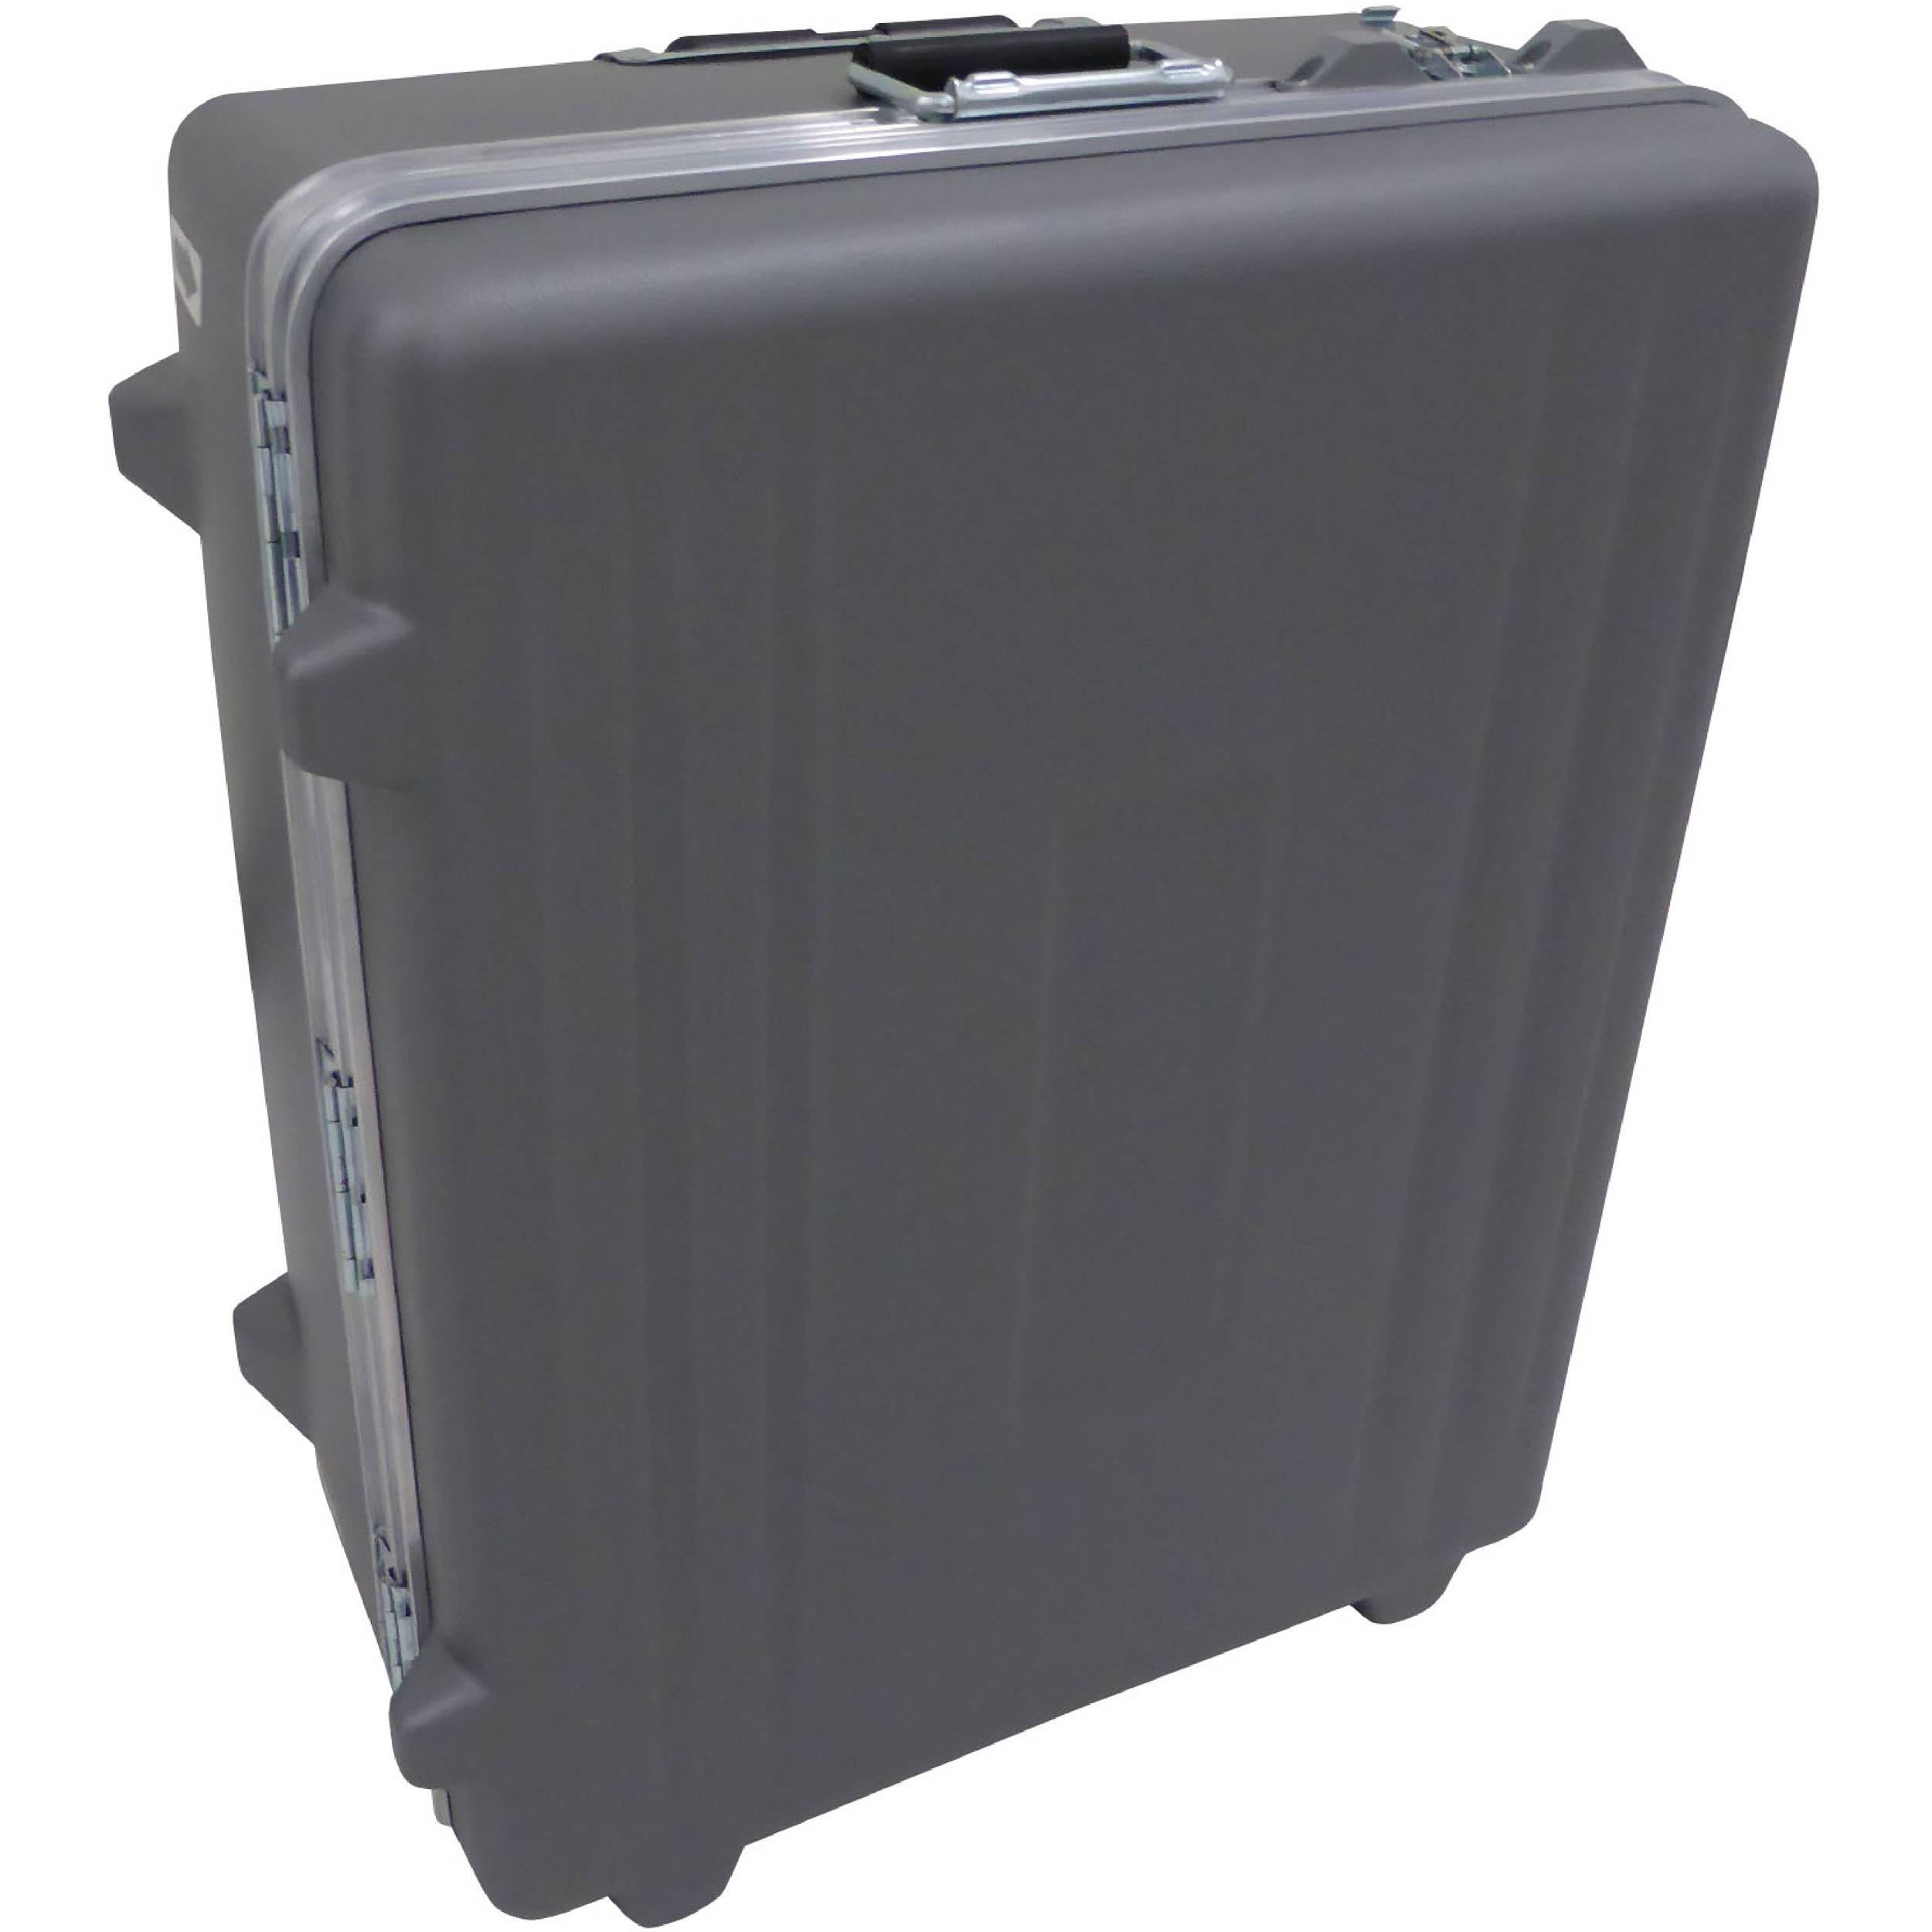 Panasonic AK-UCU500 Camera Driver UPDATE